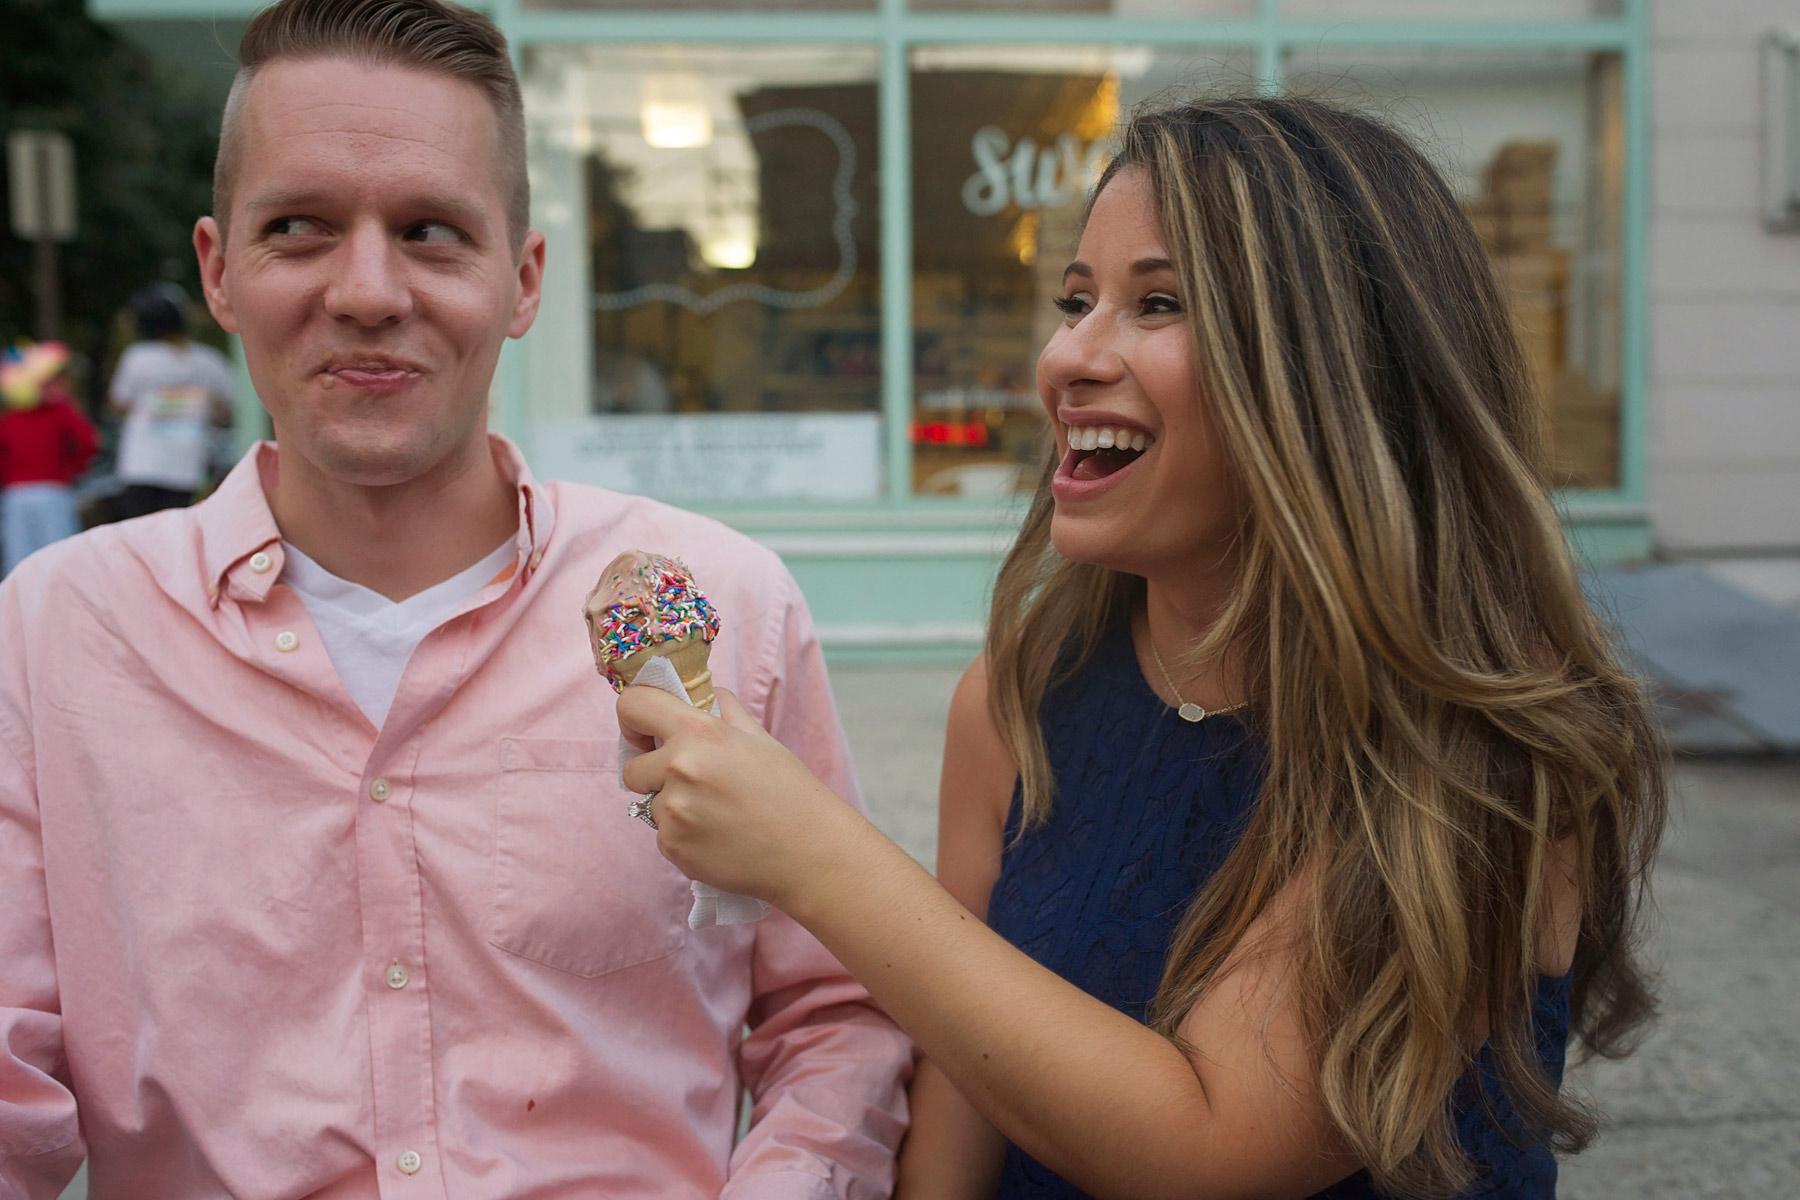 Hoboken_engagement_photographer_couple_shares_an_ice_cream_cone.JPG